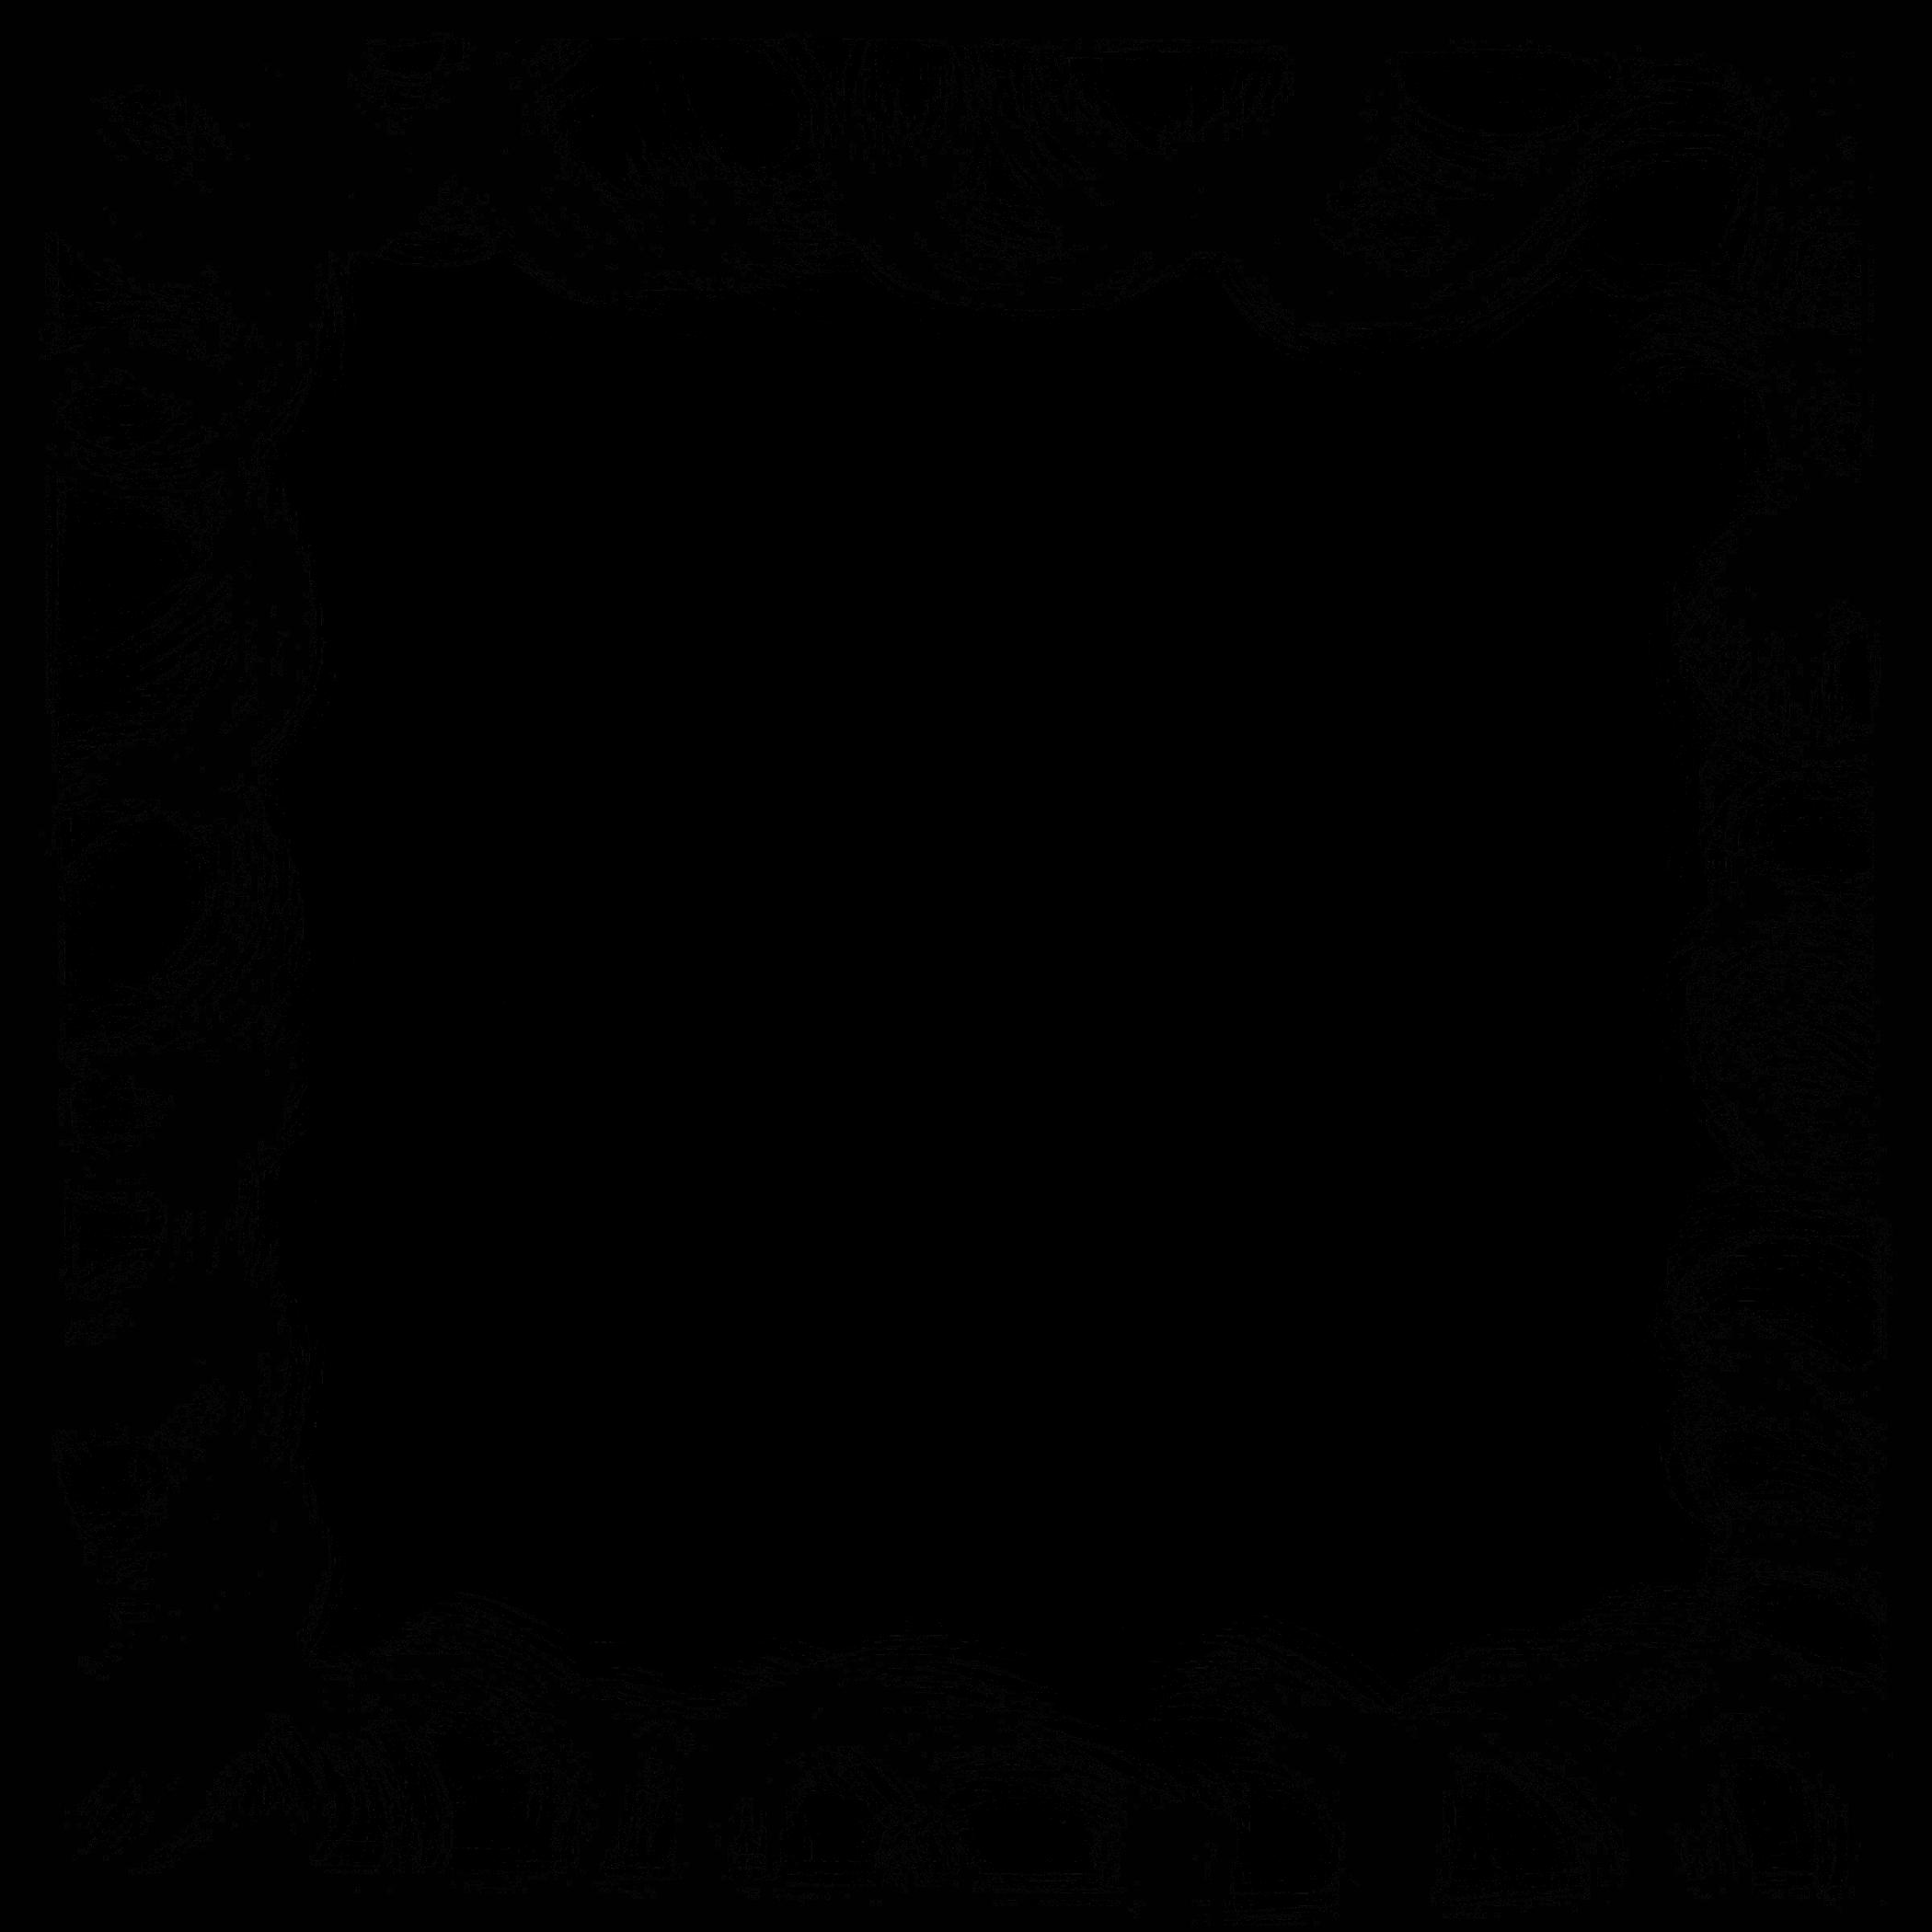 10 Square Grunge Frame (PNG Transparent) Vol  2 | OnlyGFX com